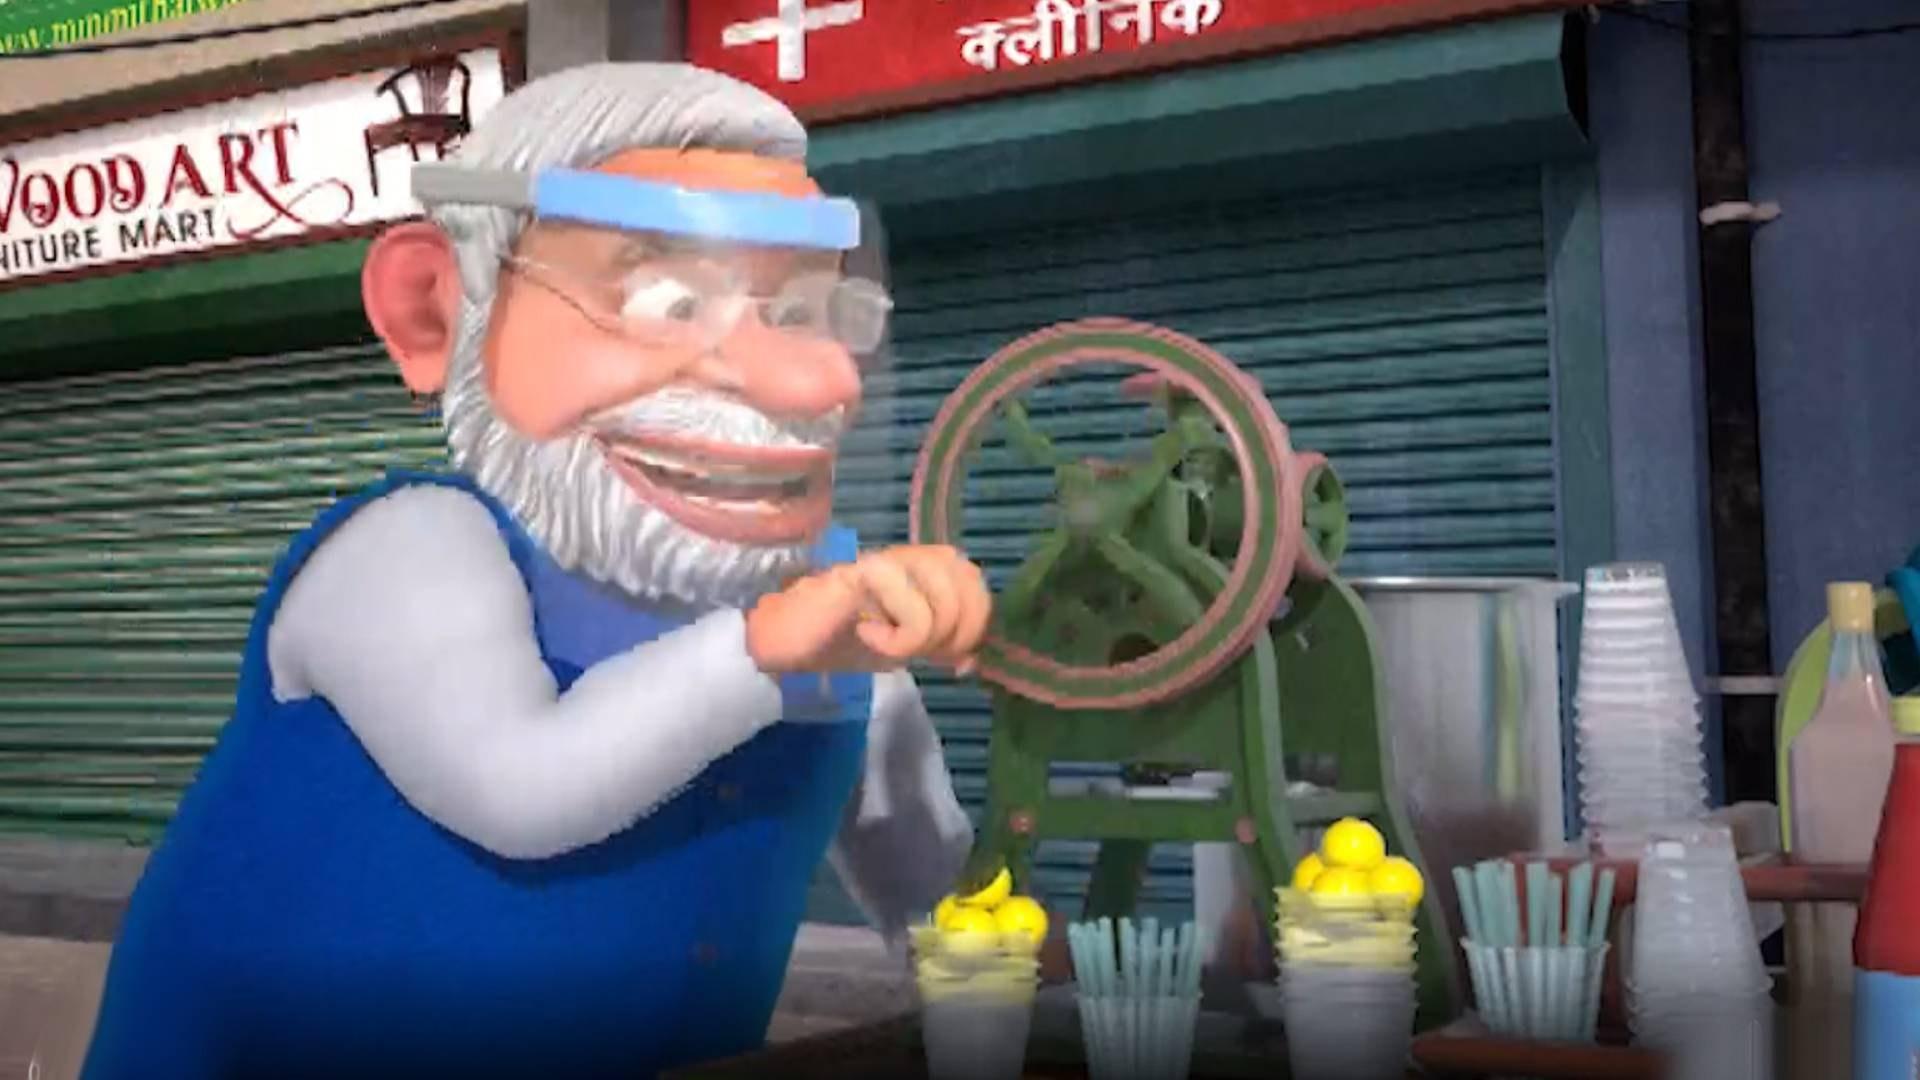 So Sorry: PM Modi gives Chak de India mantra